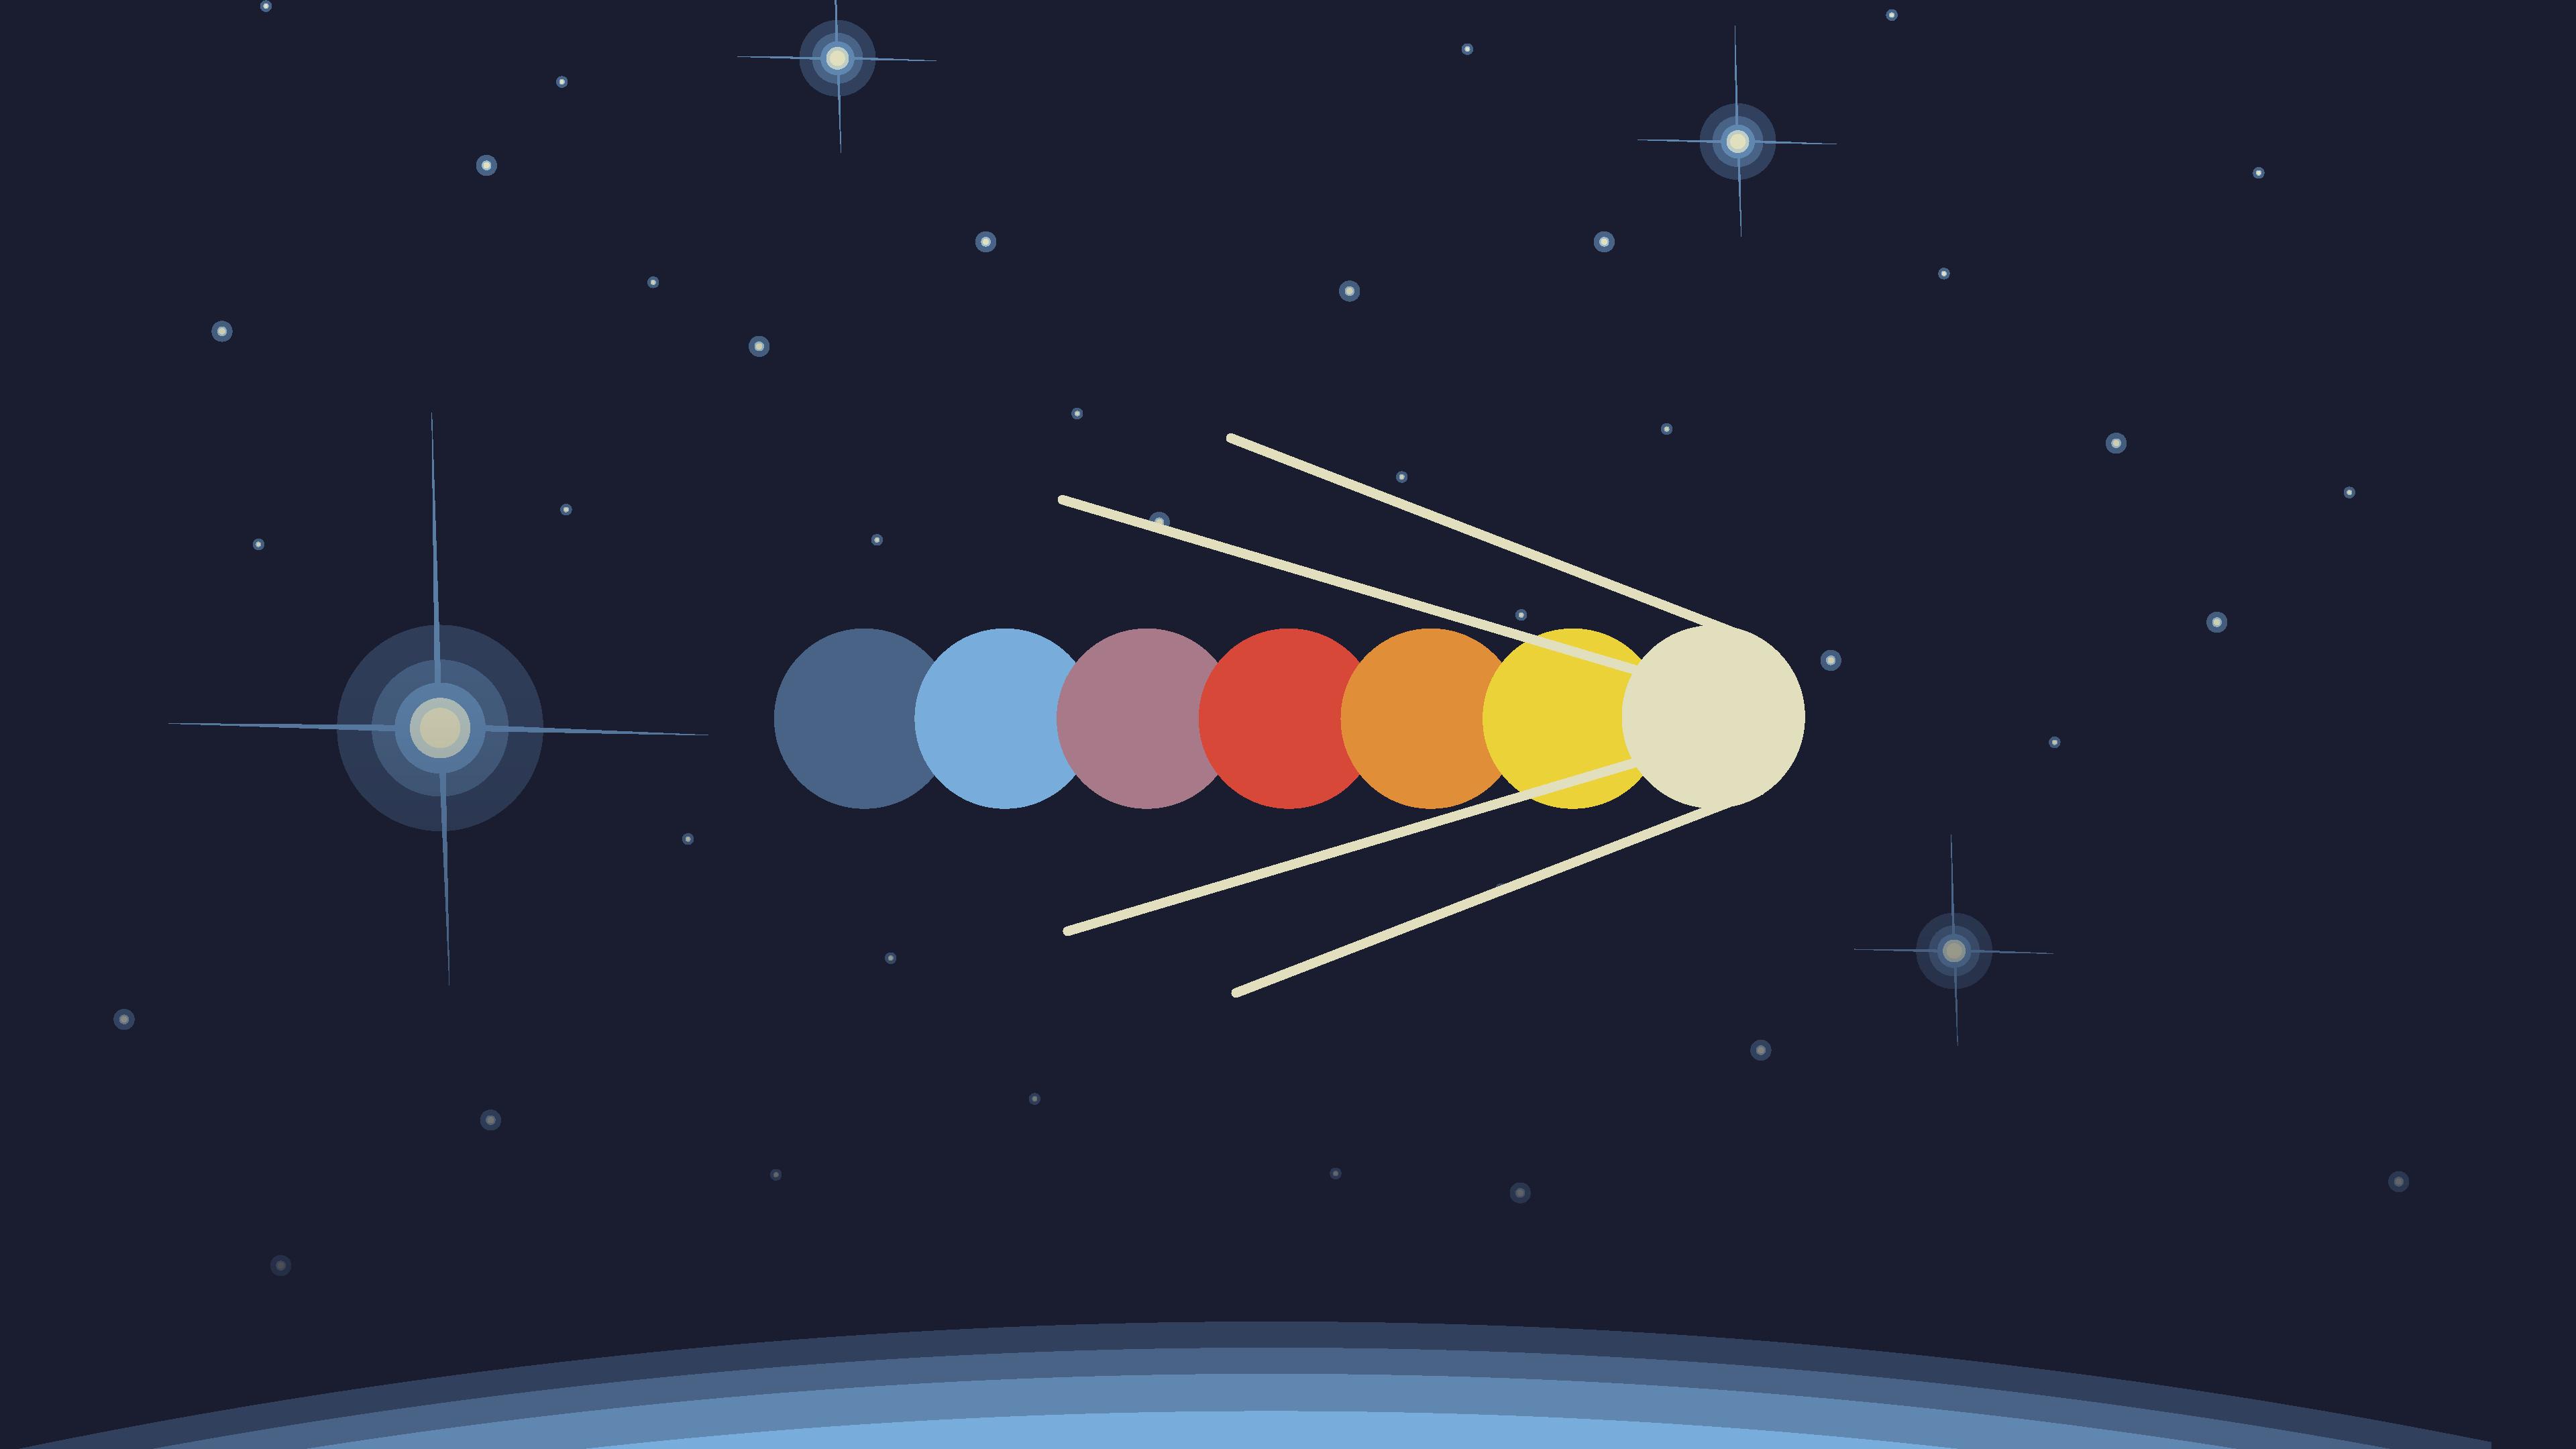 3840x2160 Minimal Space Satellite 4k Wallpaper Hd